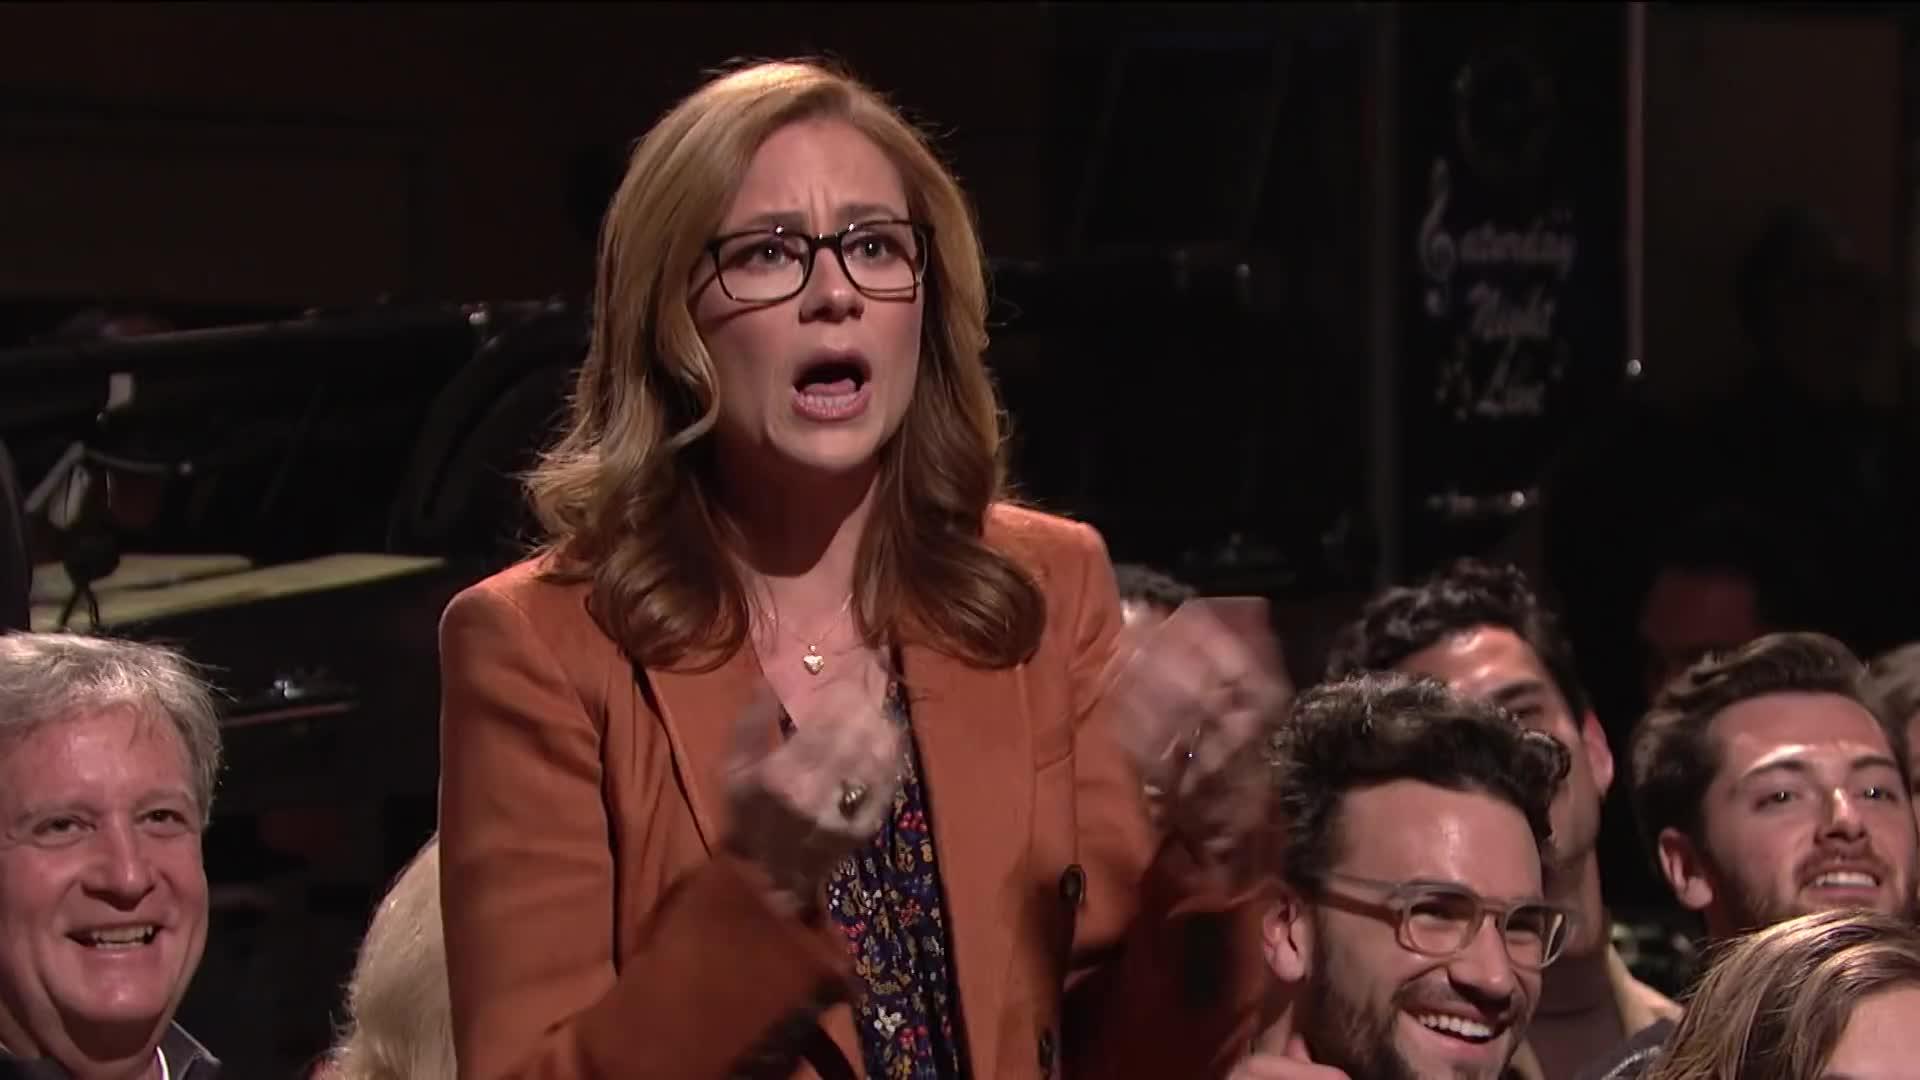 host snl, nbc, saturday night live, season 44, snl, snl 44, snl host, snl monologue, snl season 44, steve carell, Steve Carell Returns to SNL Monologue - SNL GIFs